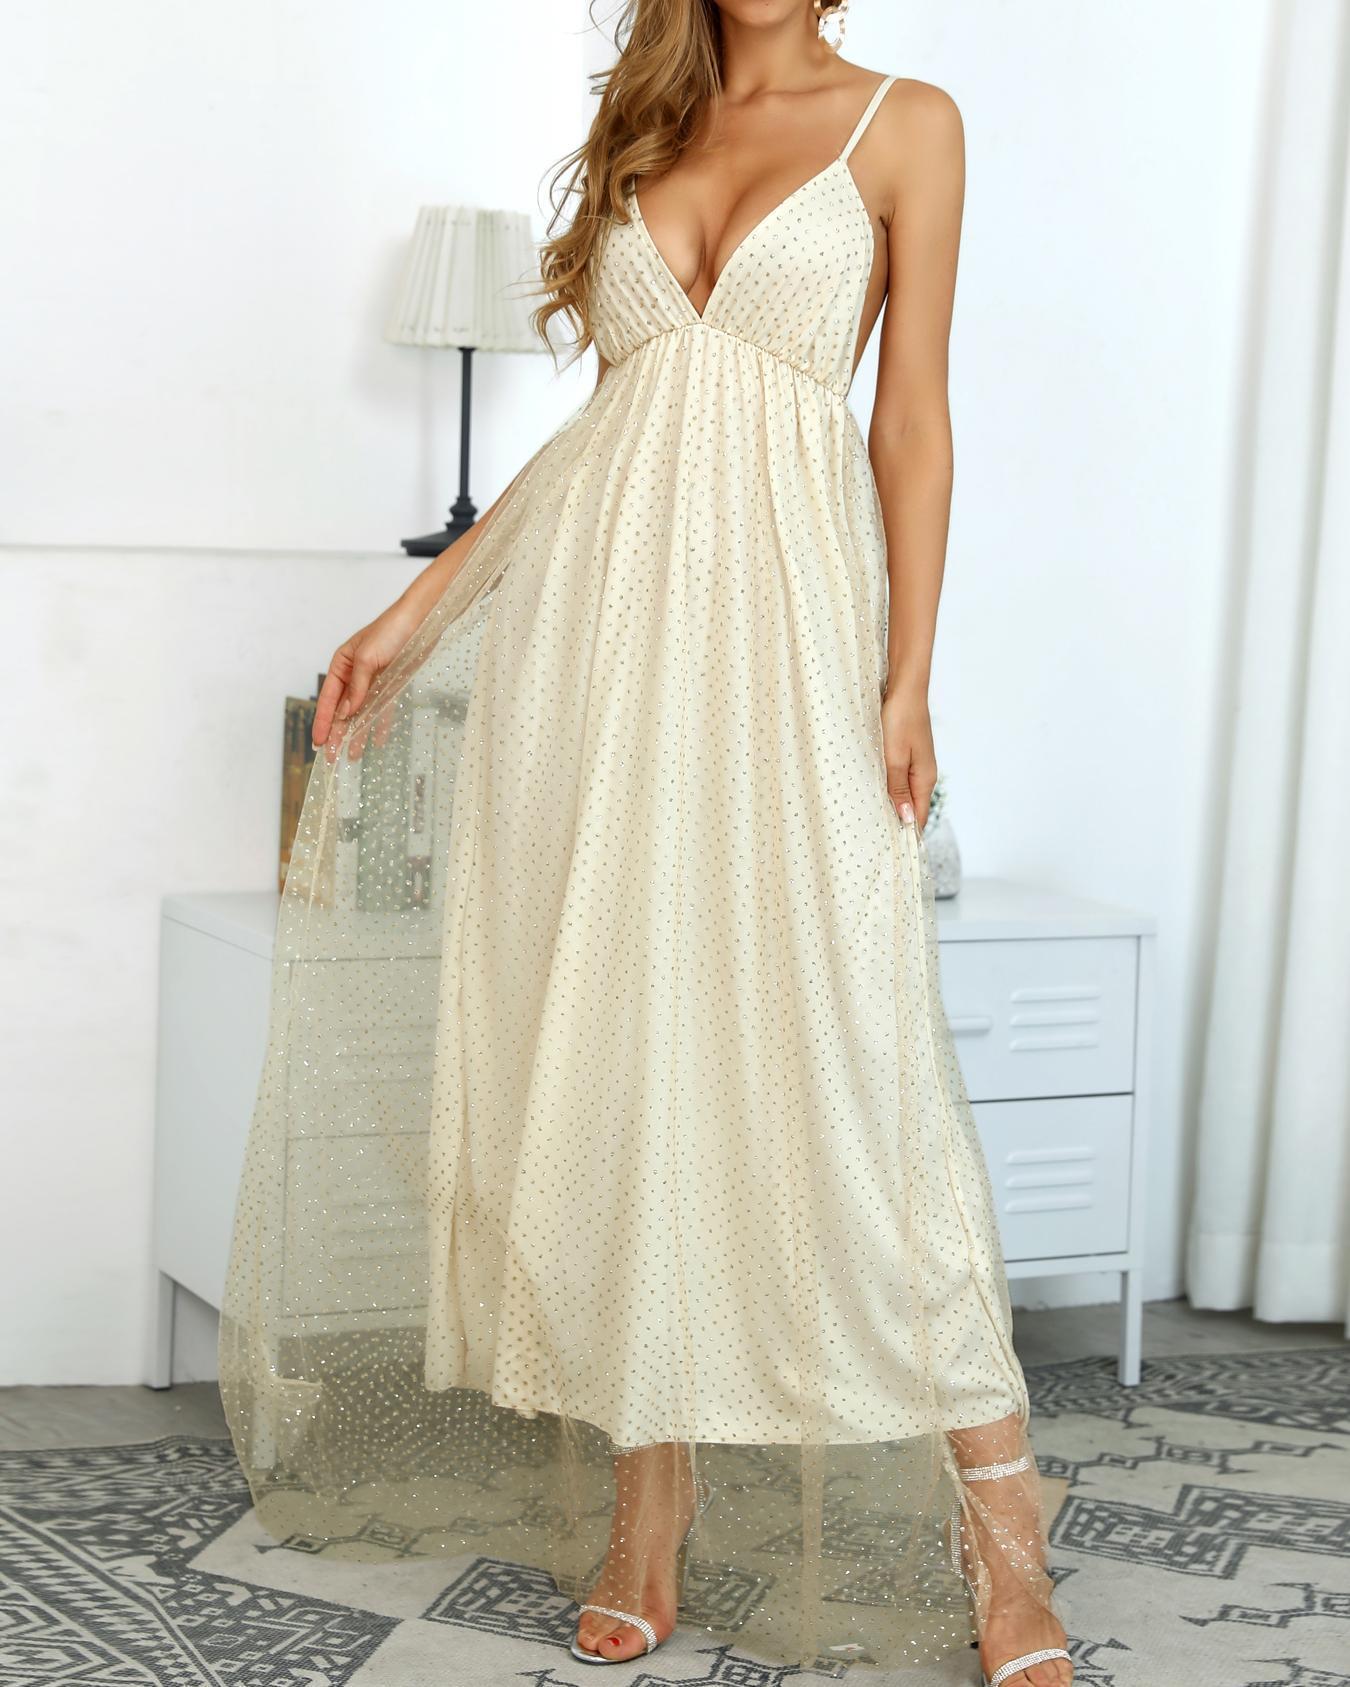 ivrose / Glitter Spaghetti Strap Mesh Overlay Vestidos Vestido